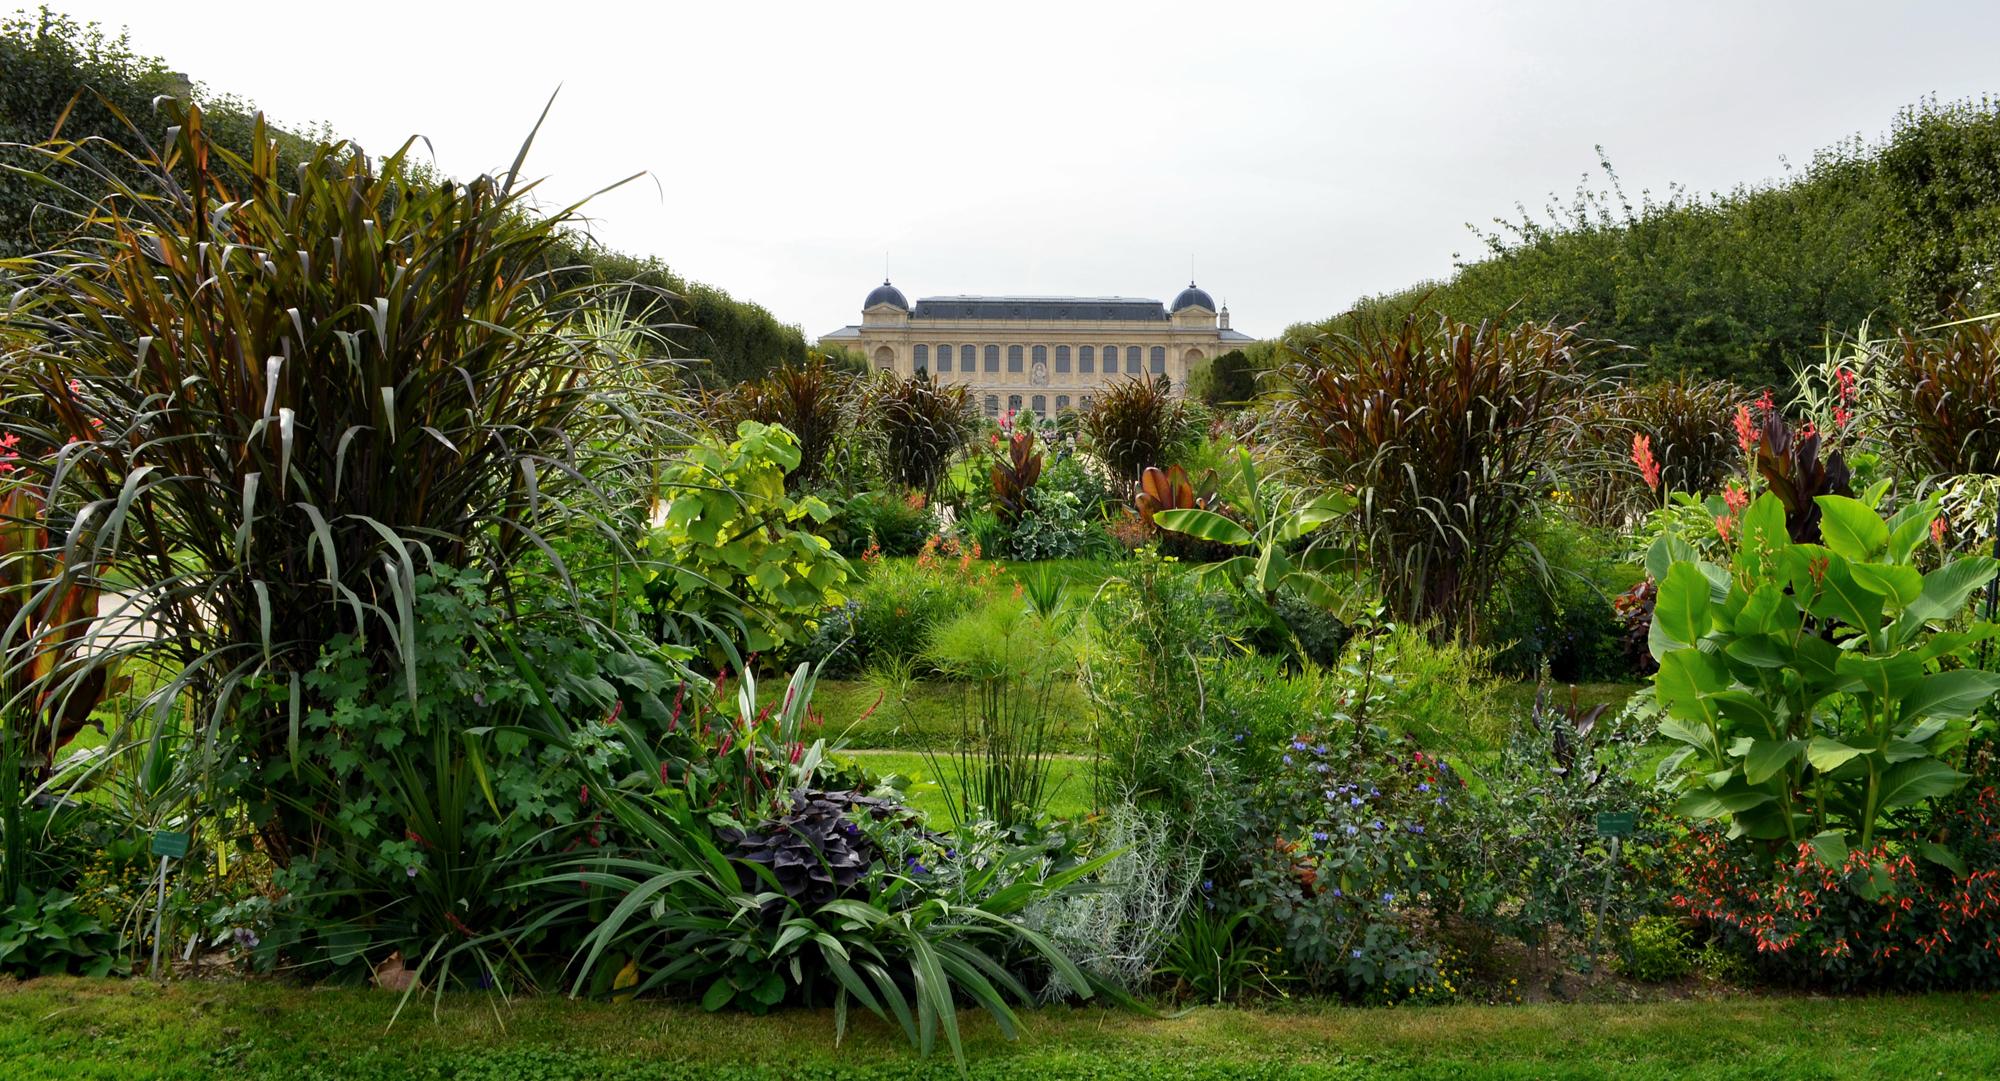 Jardin Des Plantes | Galeries, Jardins, Zoo - Jardin Des Plantes tout Faire Des Allées De Jardin